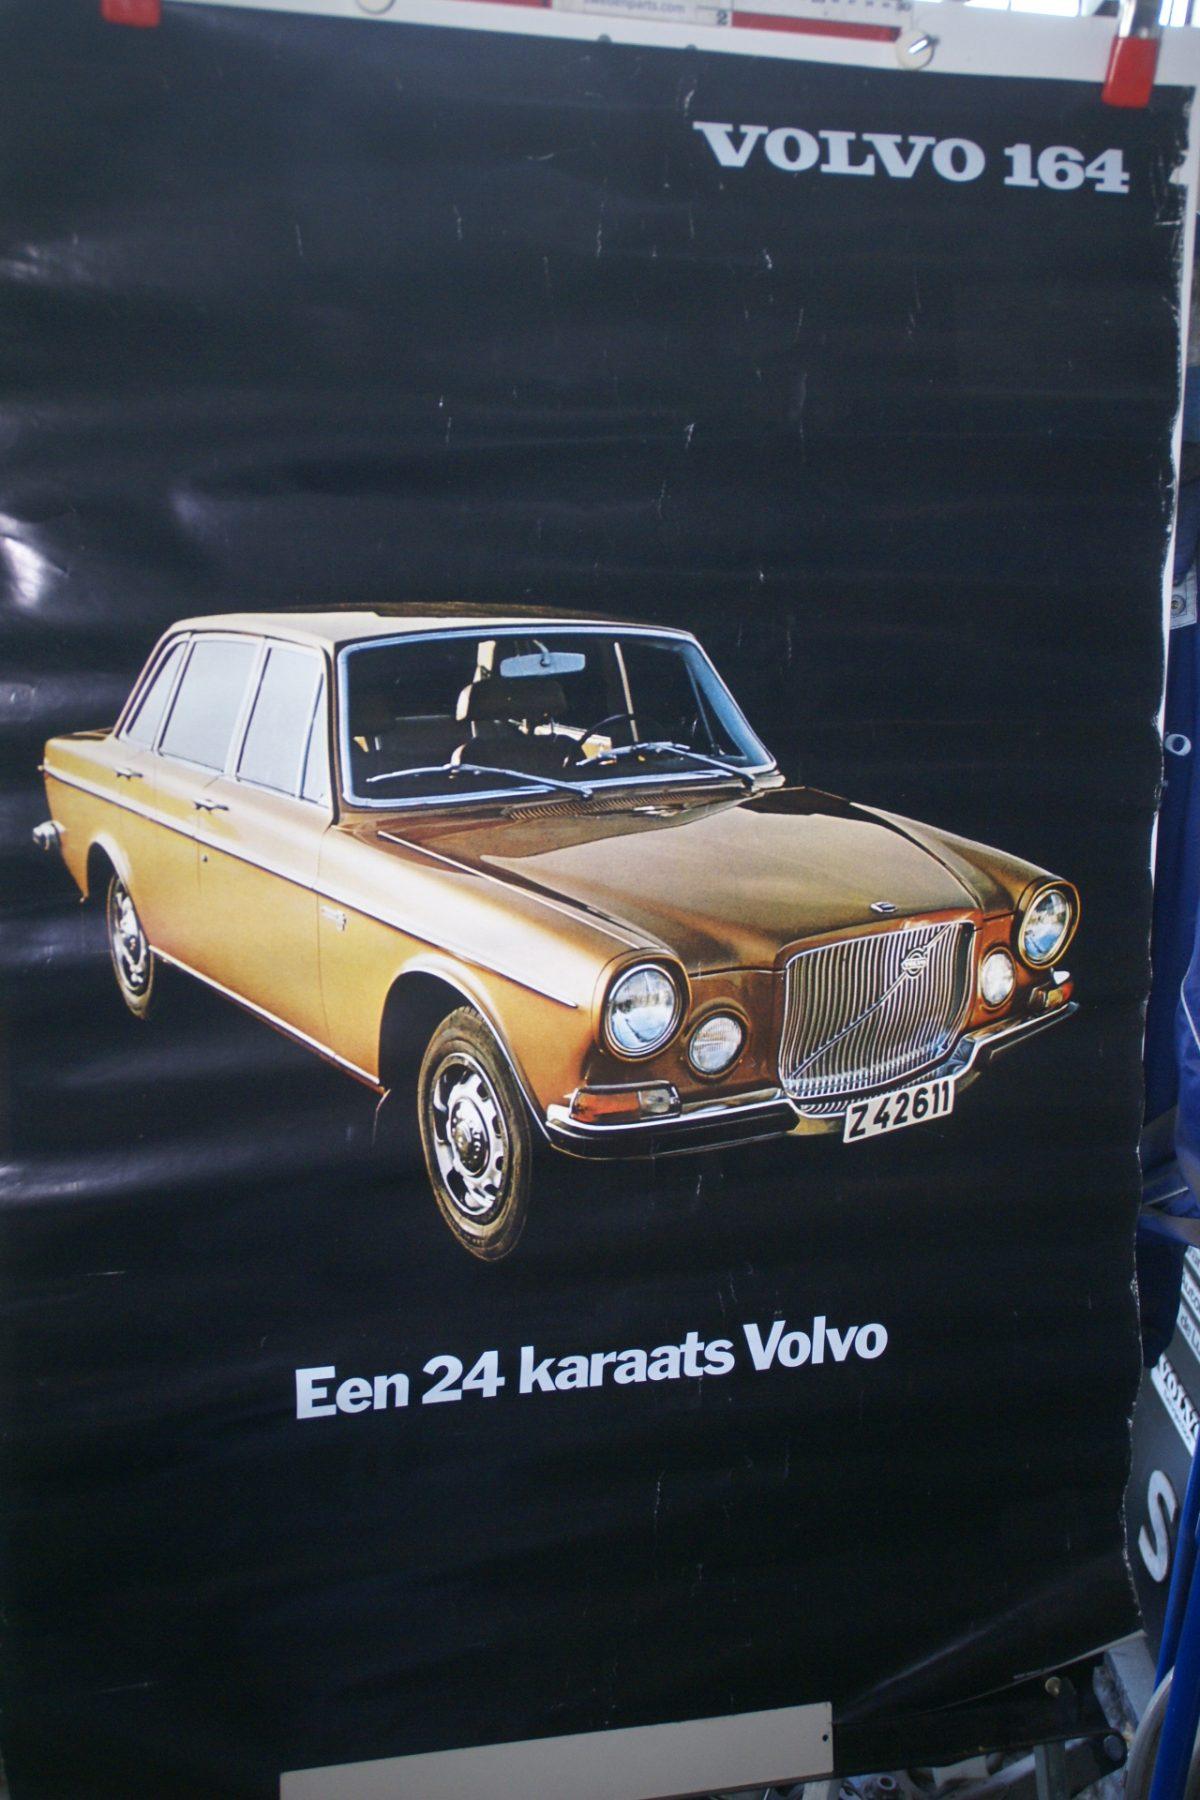 DSC02243 Volvo 164 goud poster 50247